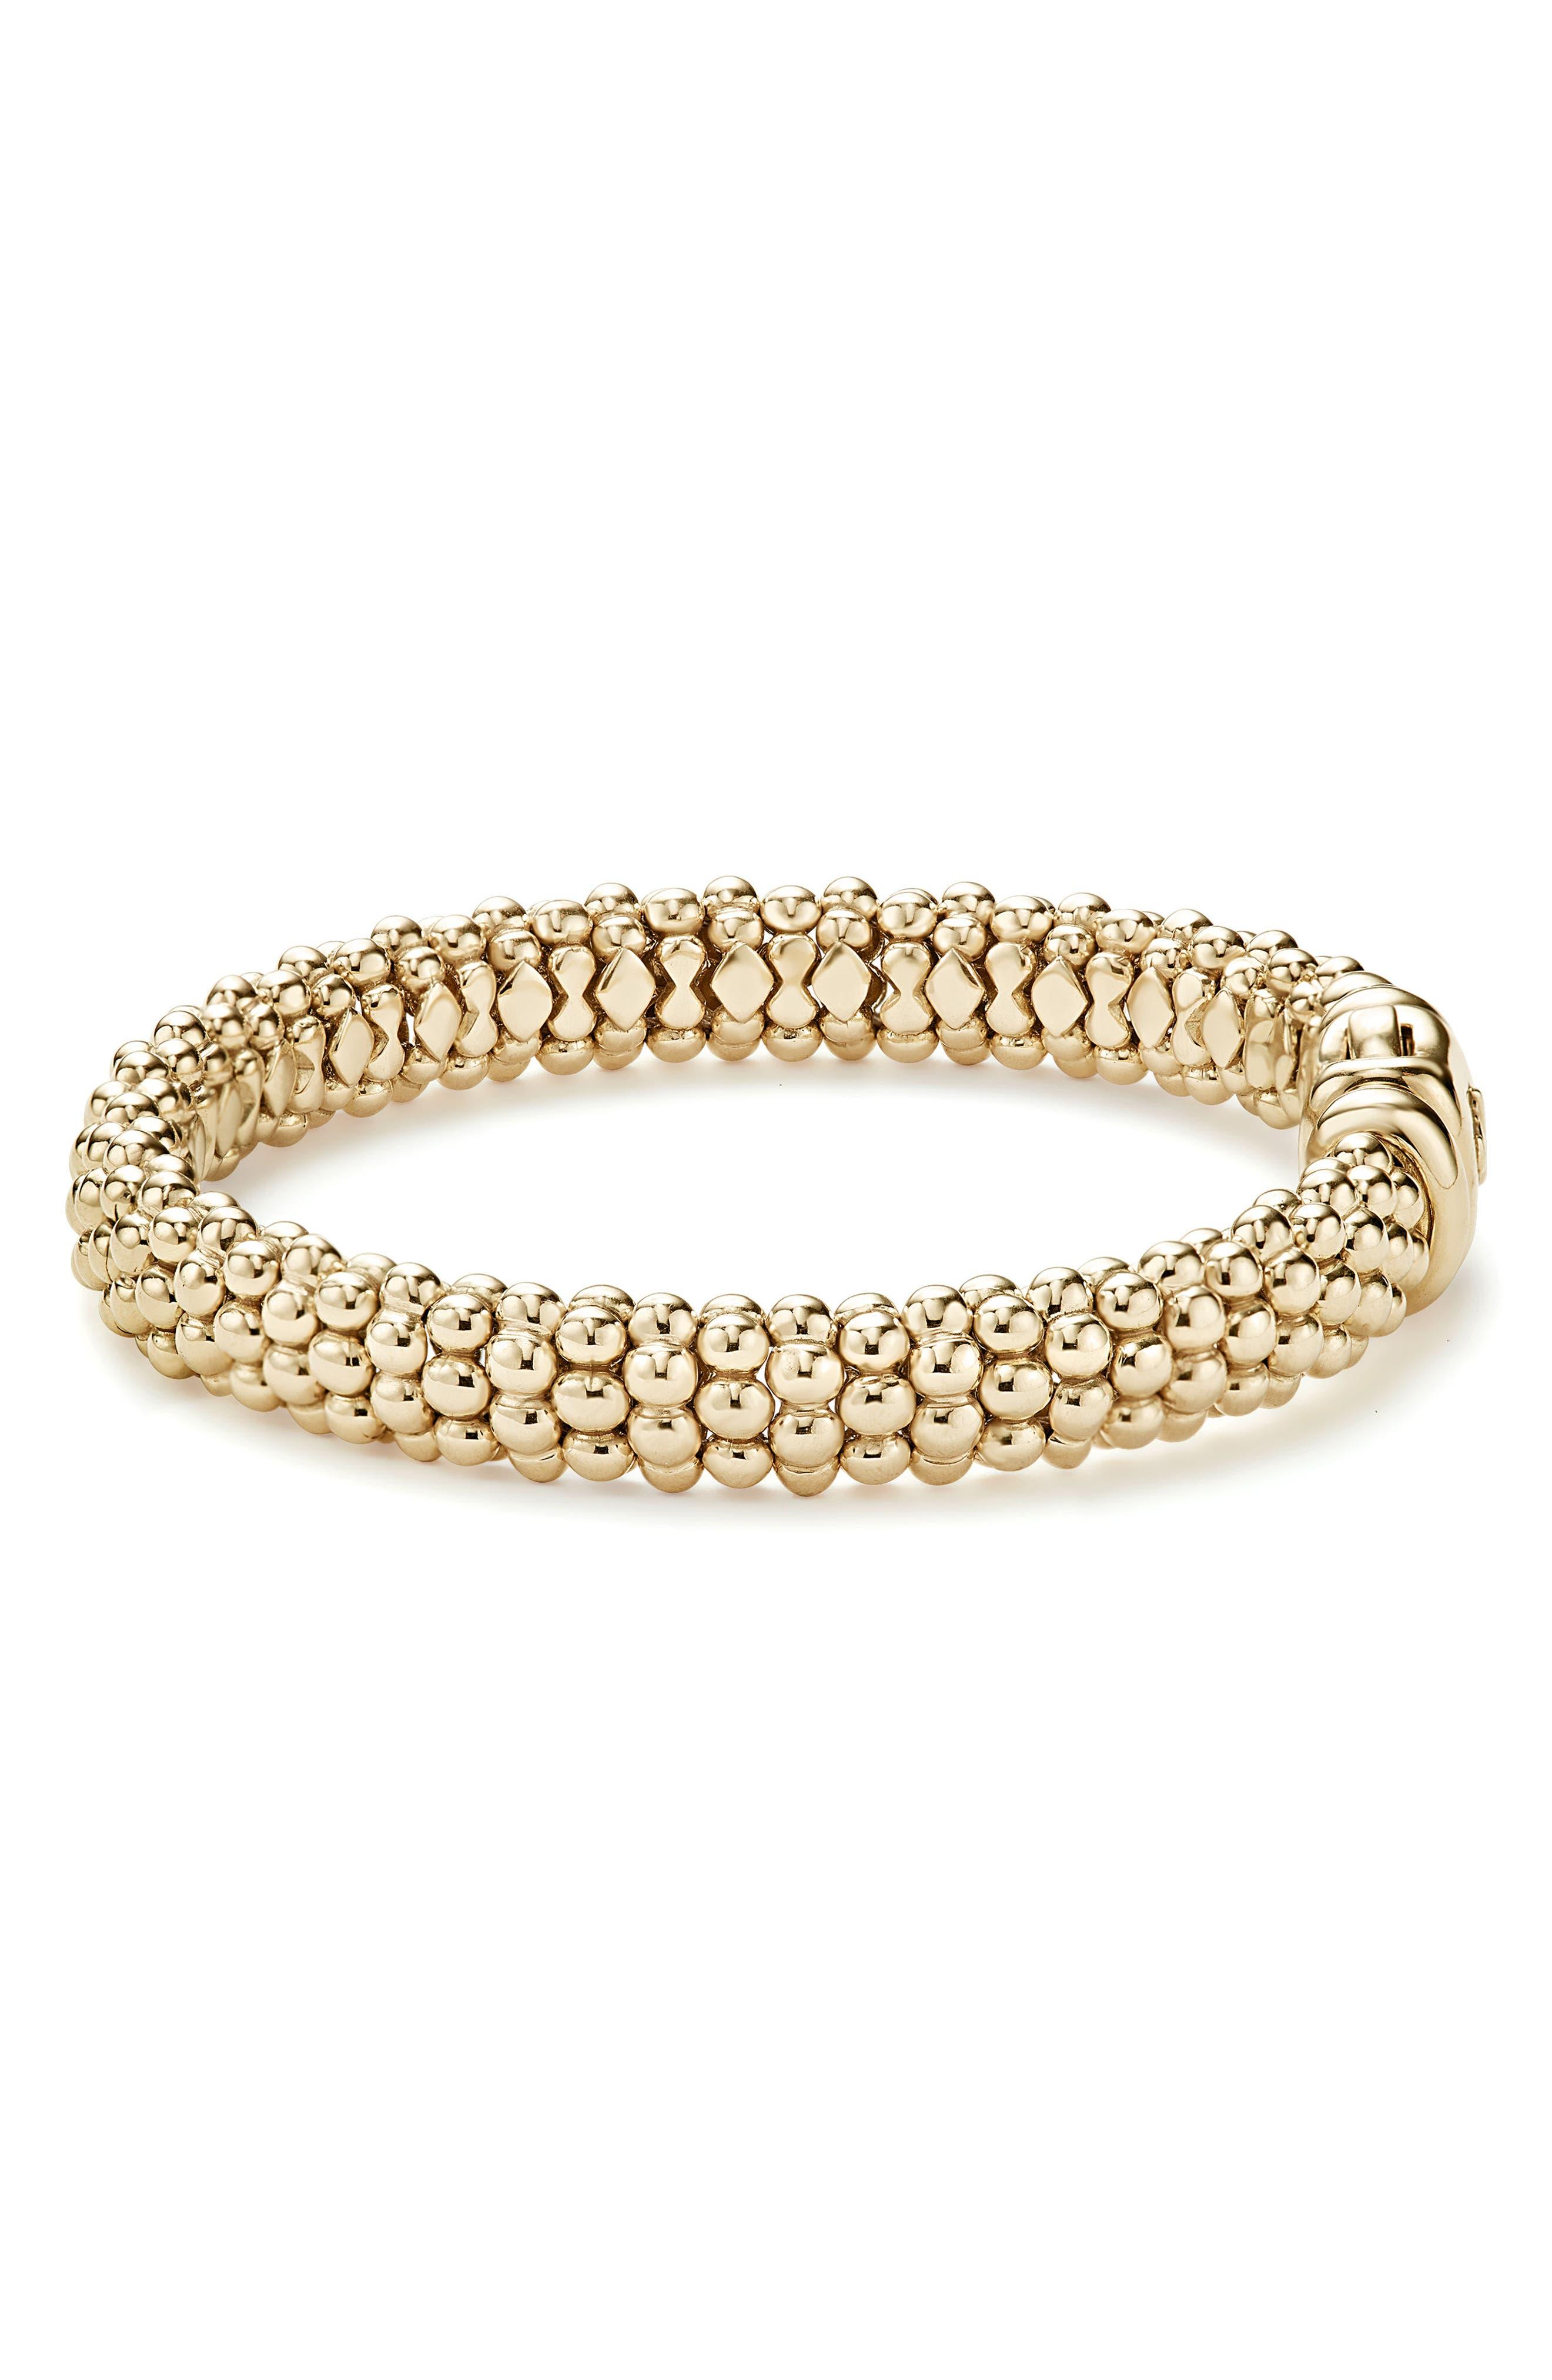 'Caviar Gold' Rope Bracelet,                             Alternate thumbnail 5, color,                             GOLD